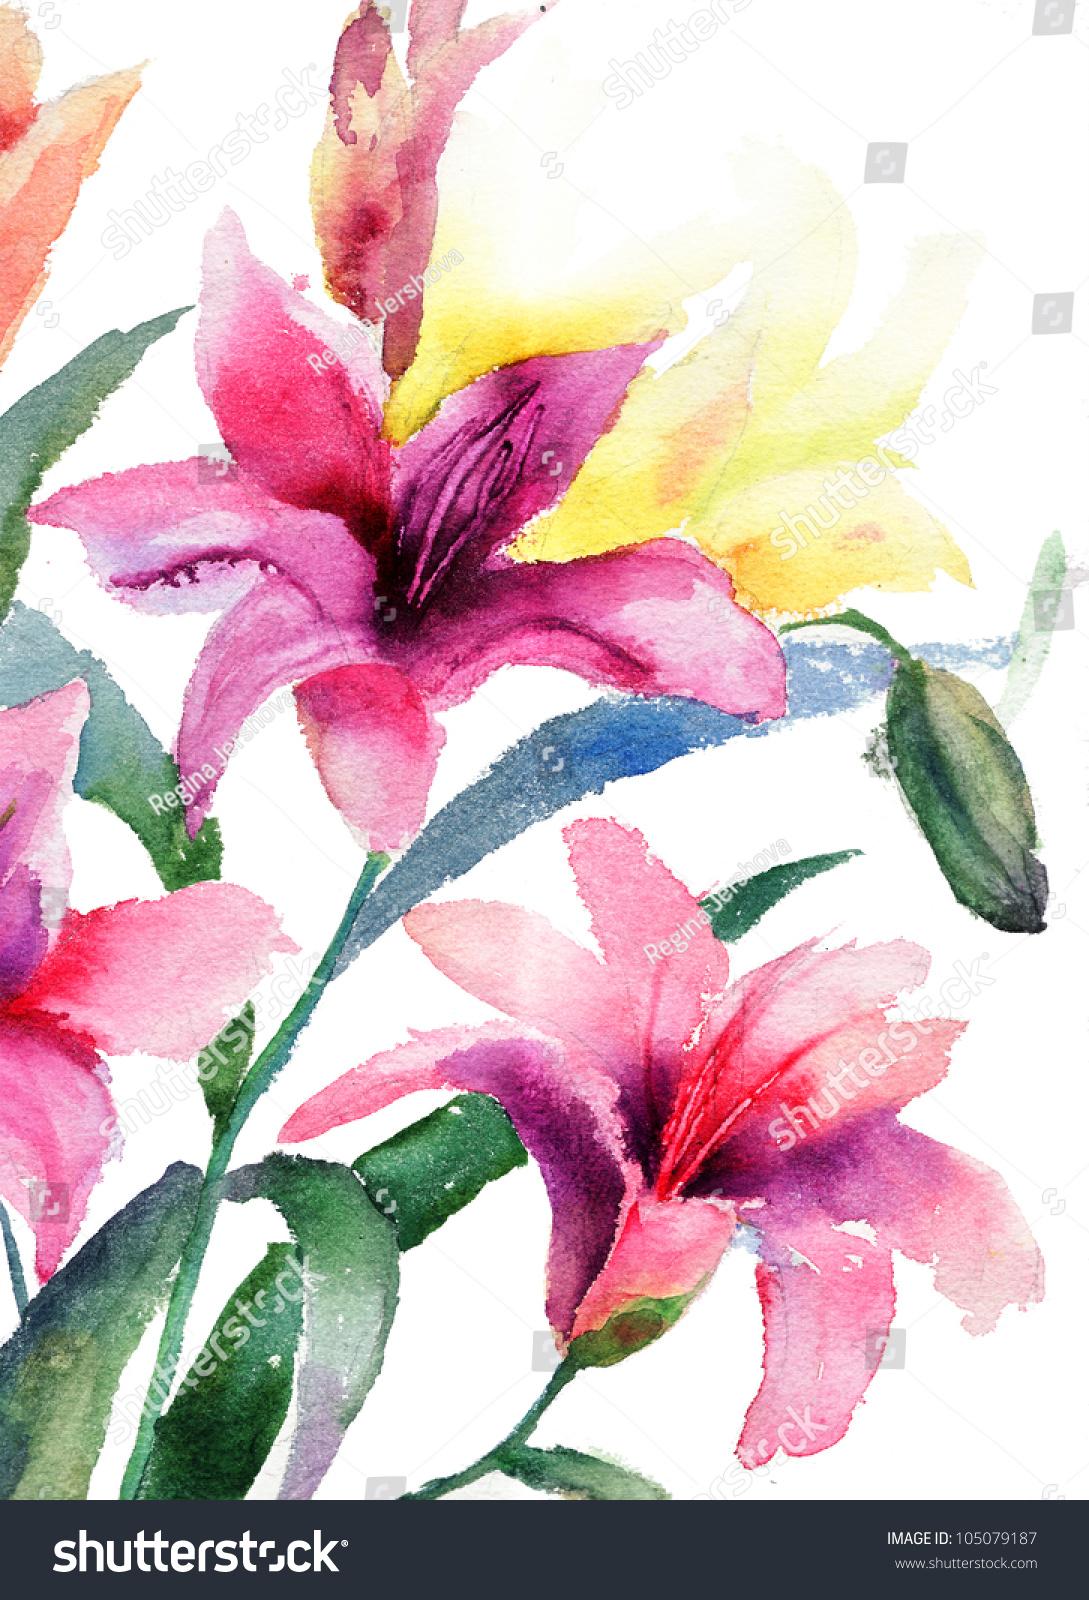 Beautiful lily flowers watercolor illustration stock illustration beautiful lily flowers watercolor illustration izmirmasajfo